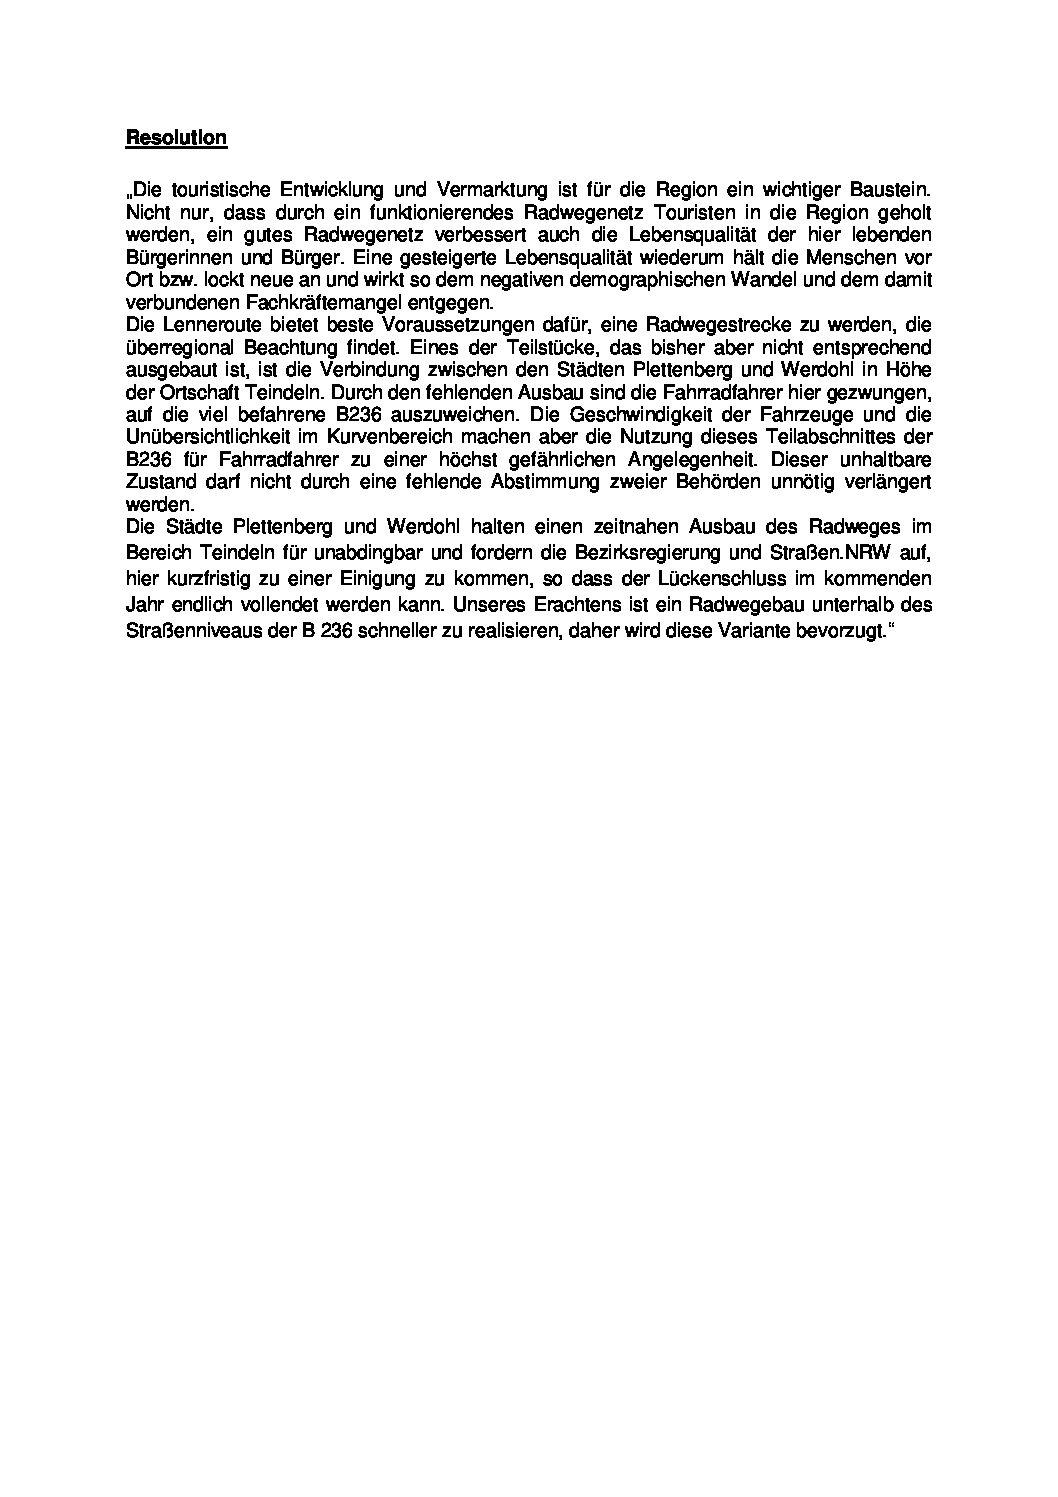 Resolution zum Thema Radwege